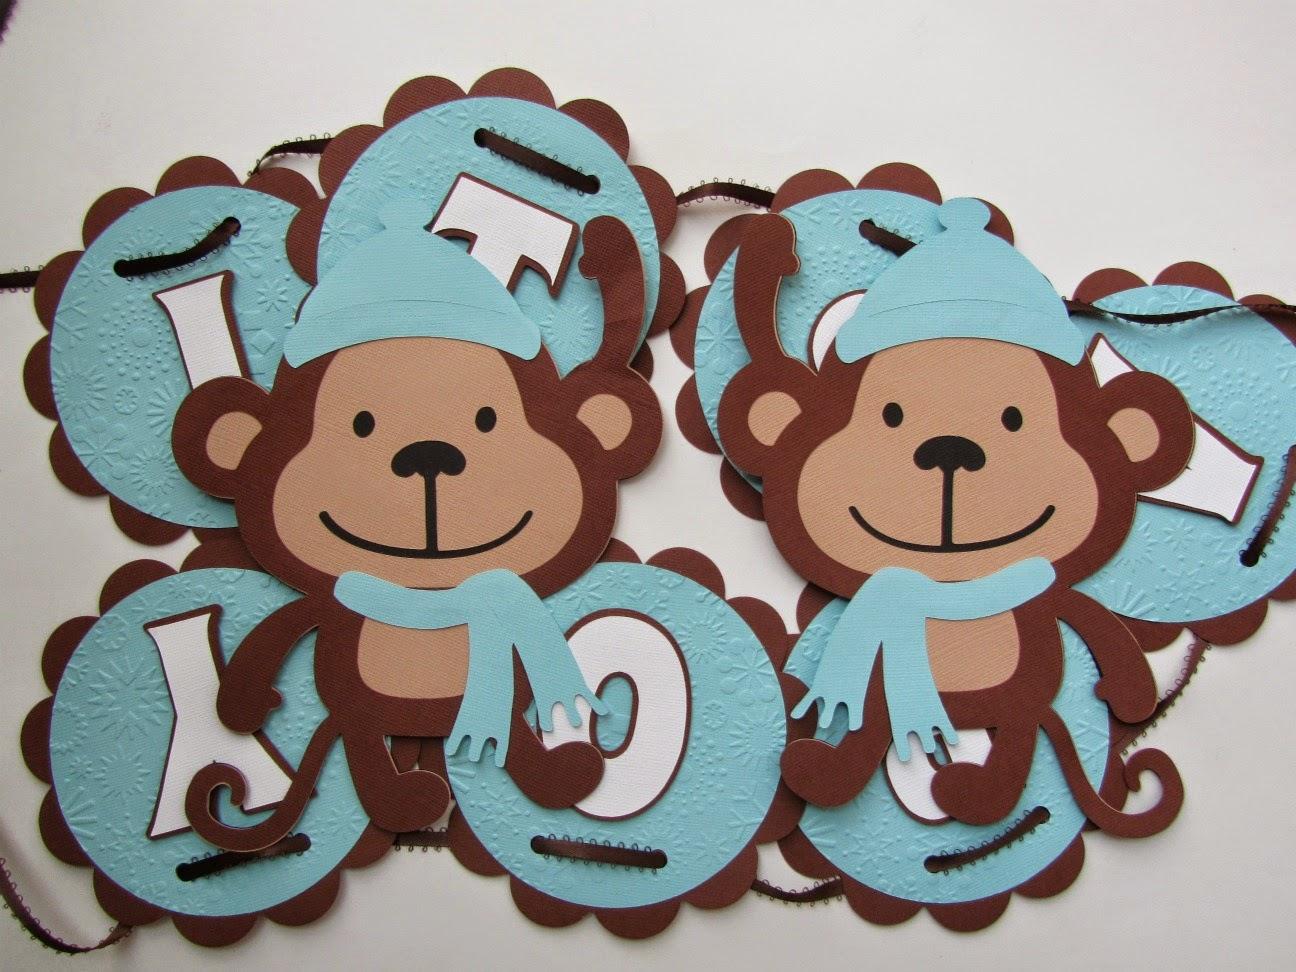 Jingvitations cricut monkey baby shower banner - Baby shower monkey pictures ...